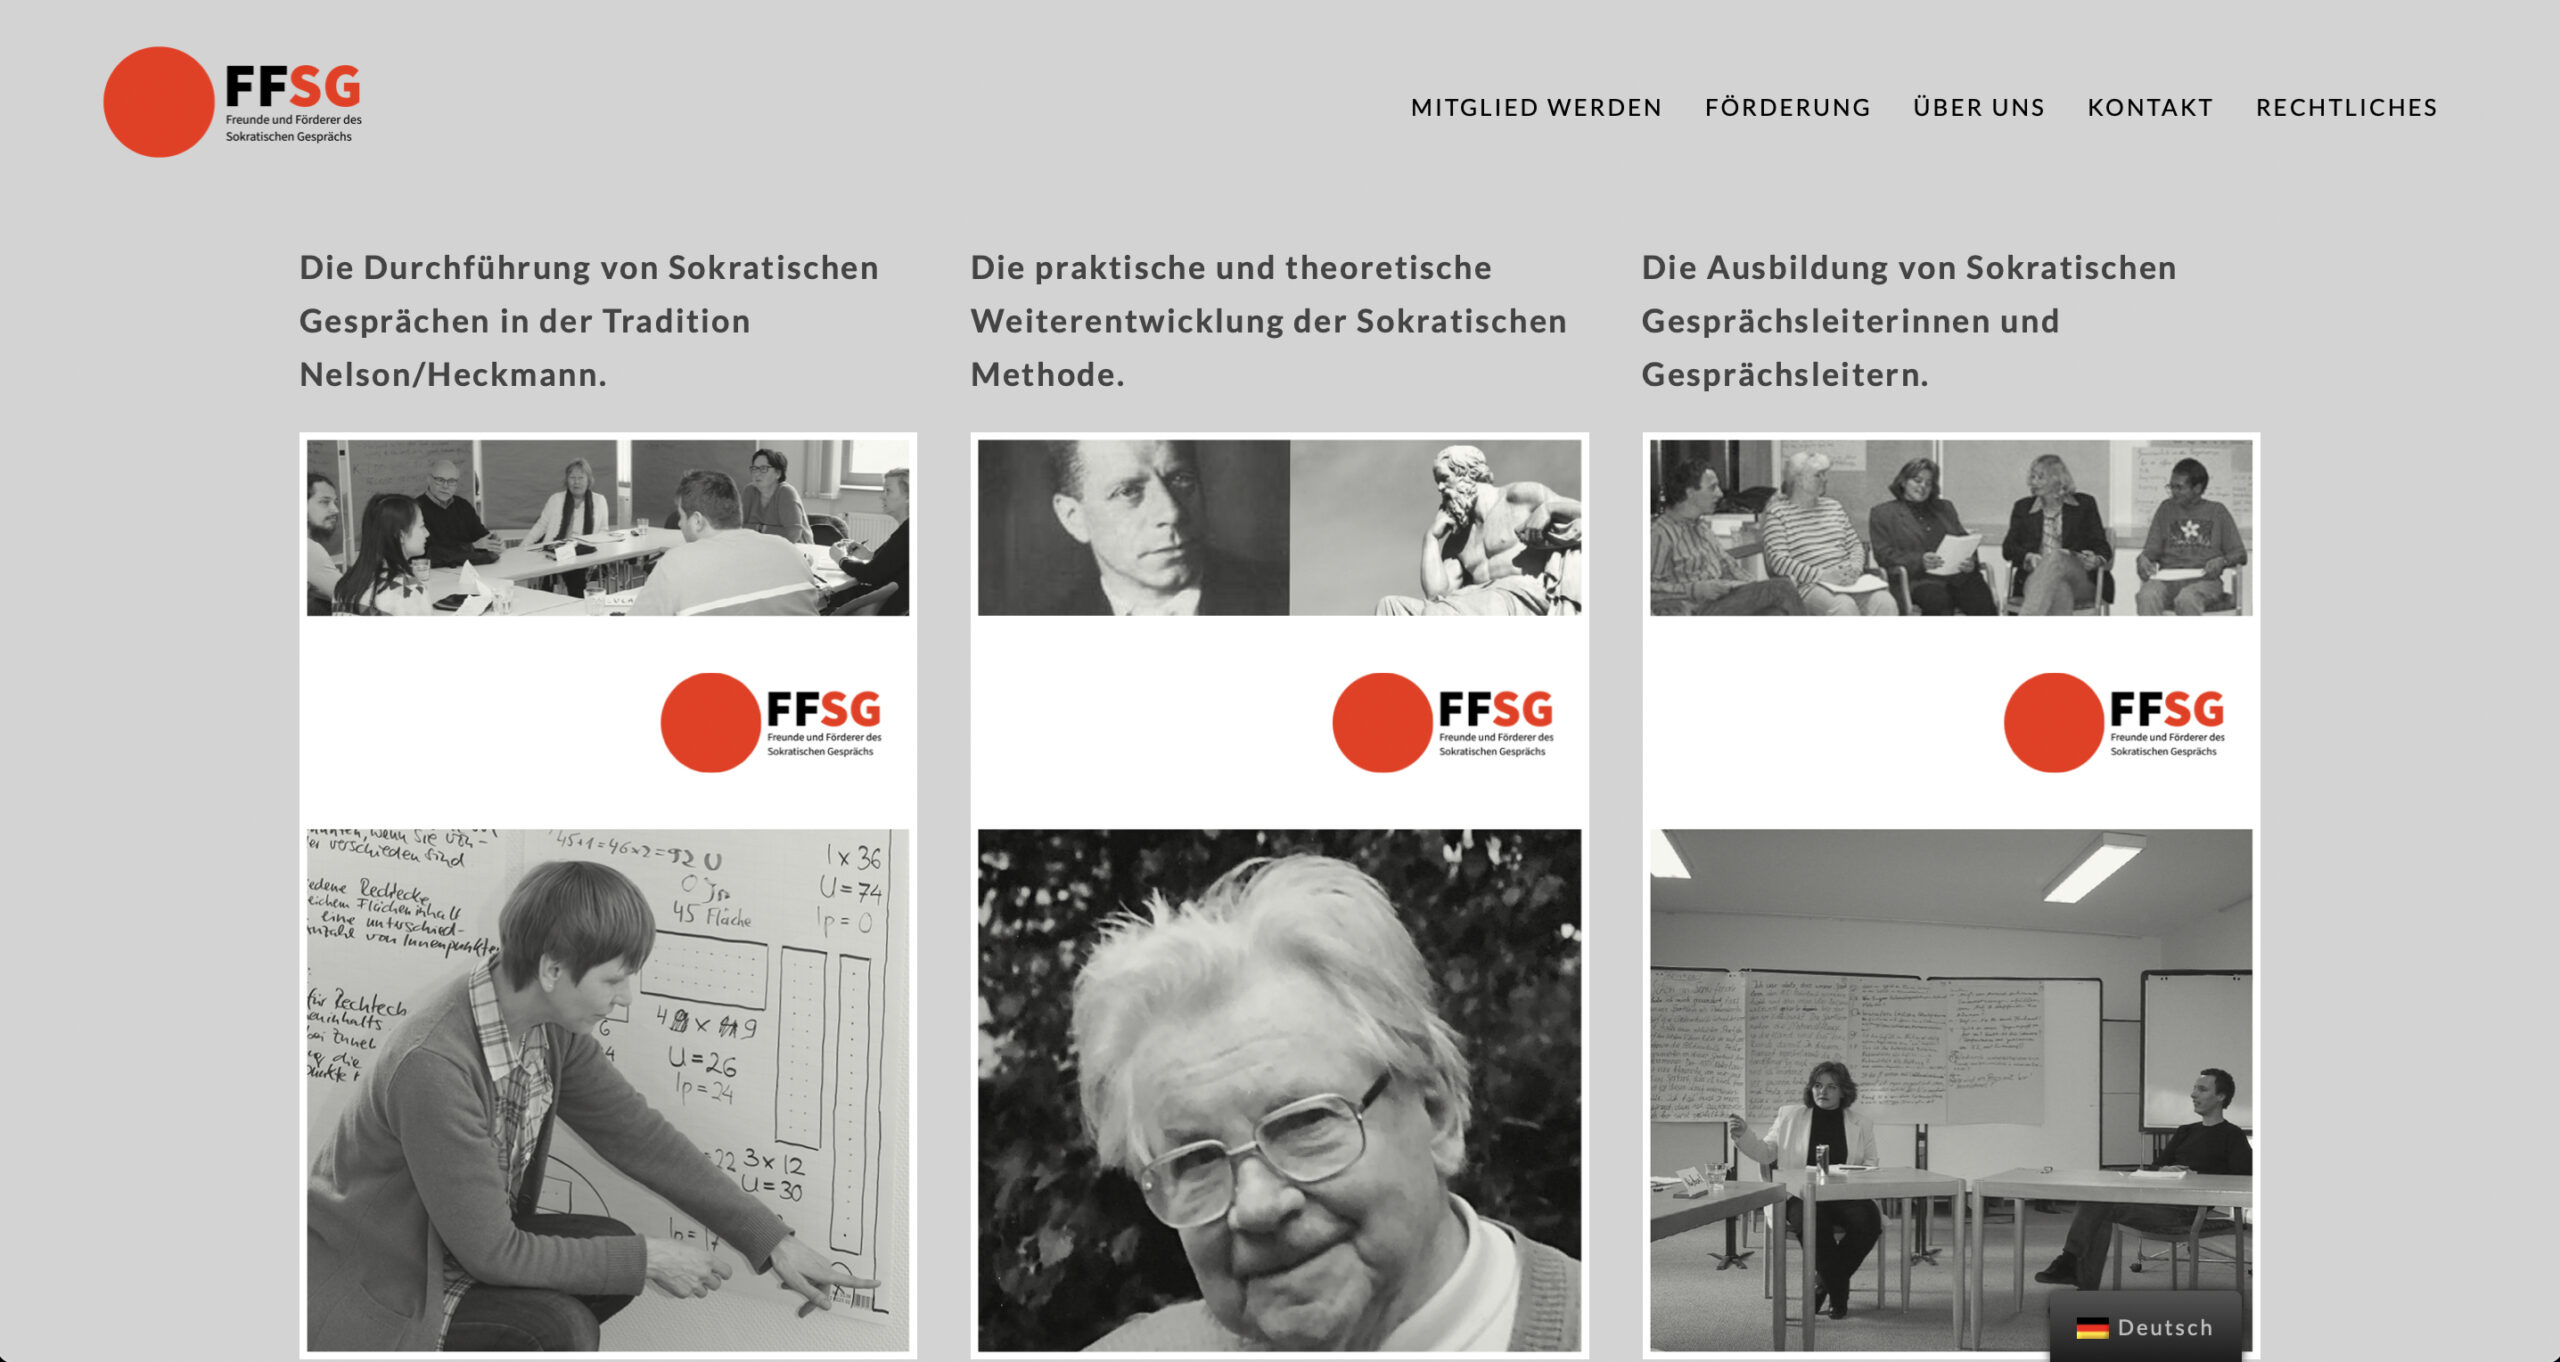 FFSG Flyers